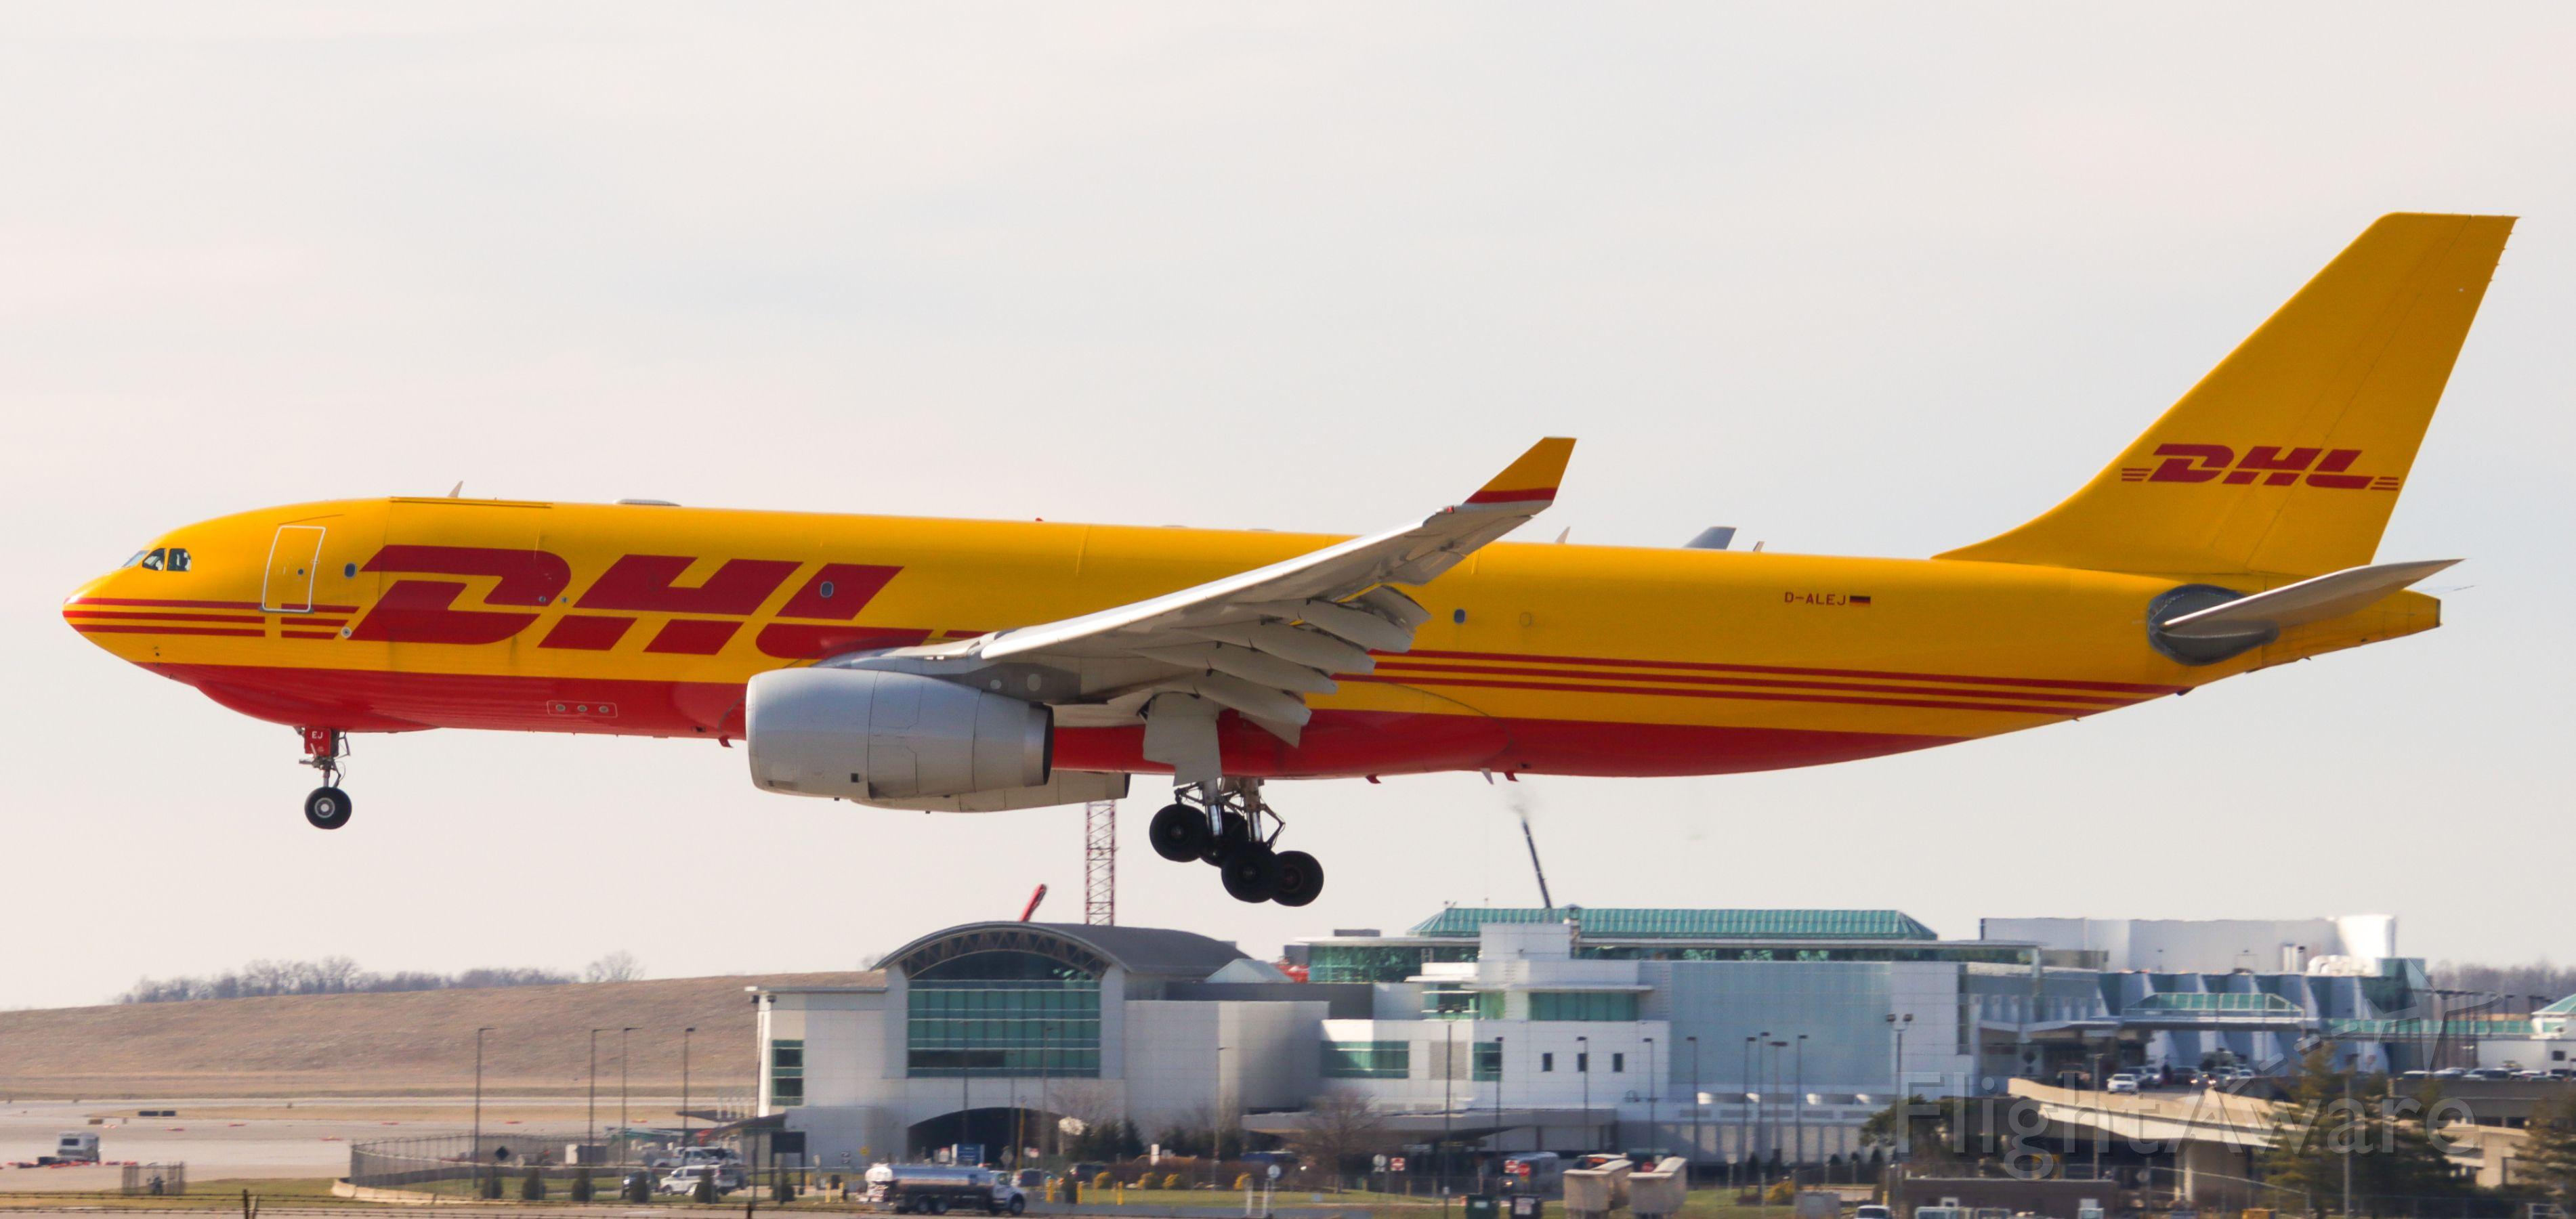 Airbus A330-200 (D-ALEJ)